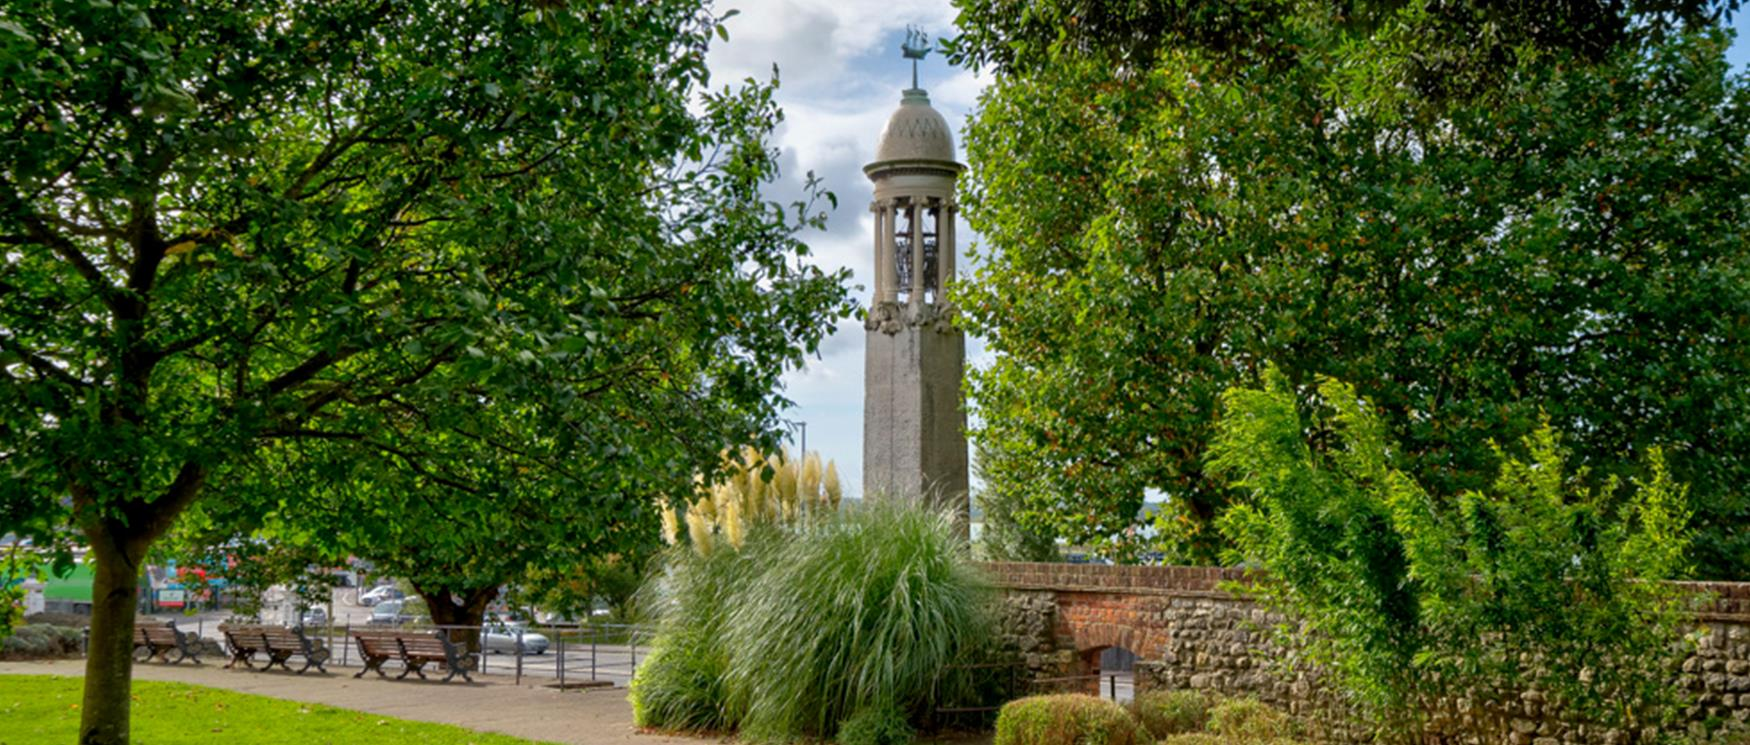 Southampton's Mayflower 400 Memorial